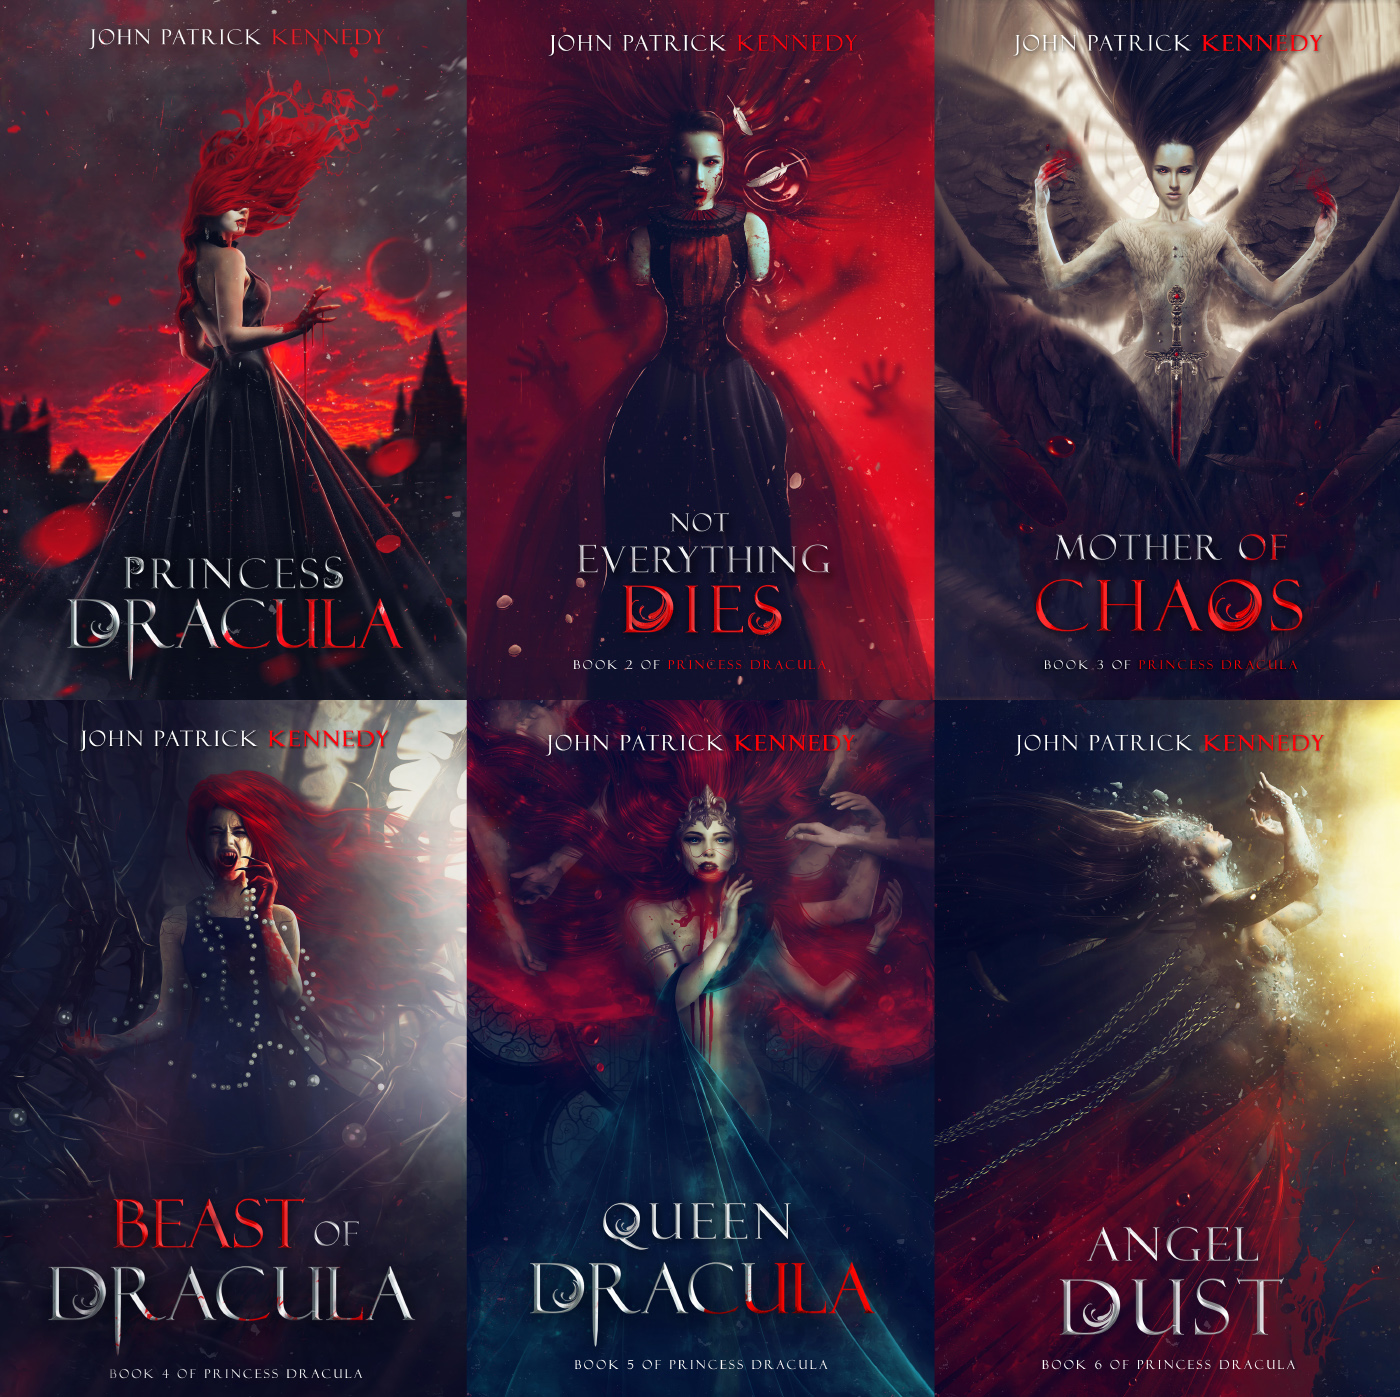 Saga Princess Dracula (Book covers) by Carlos-Quevedo